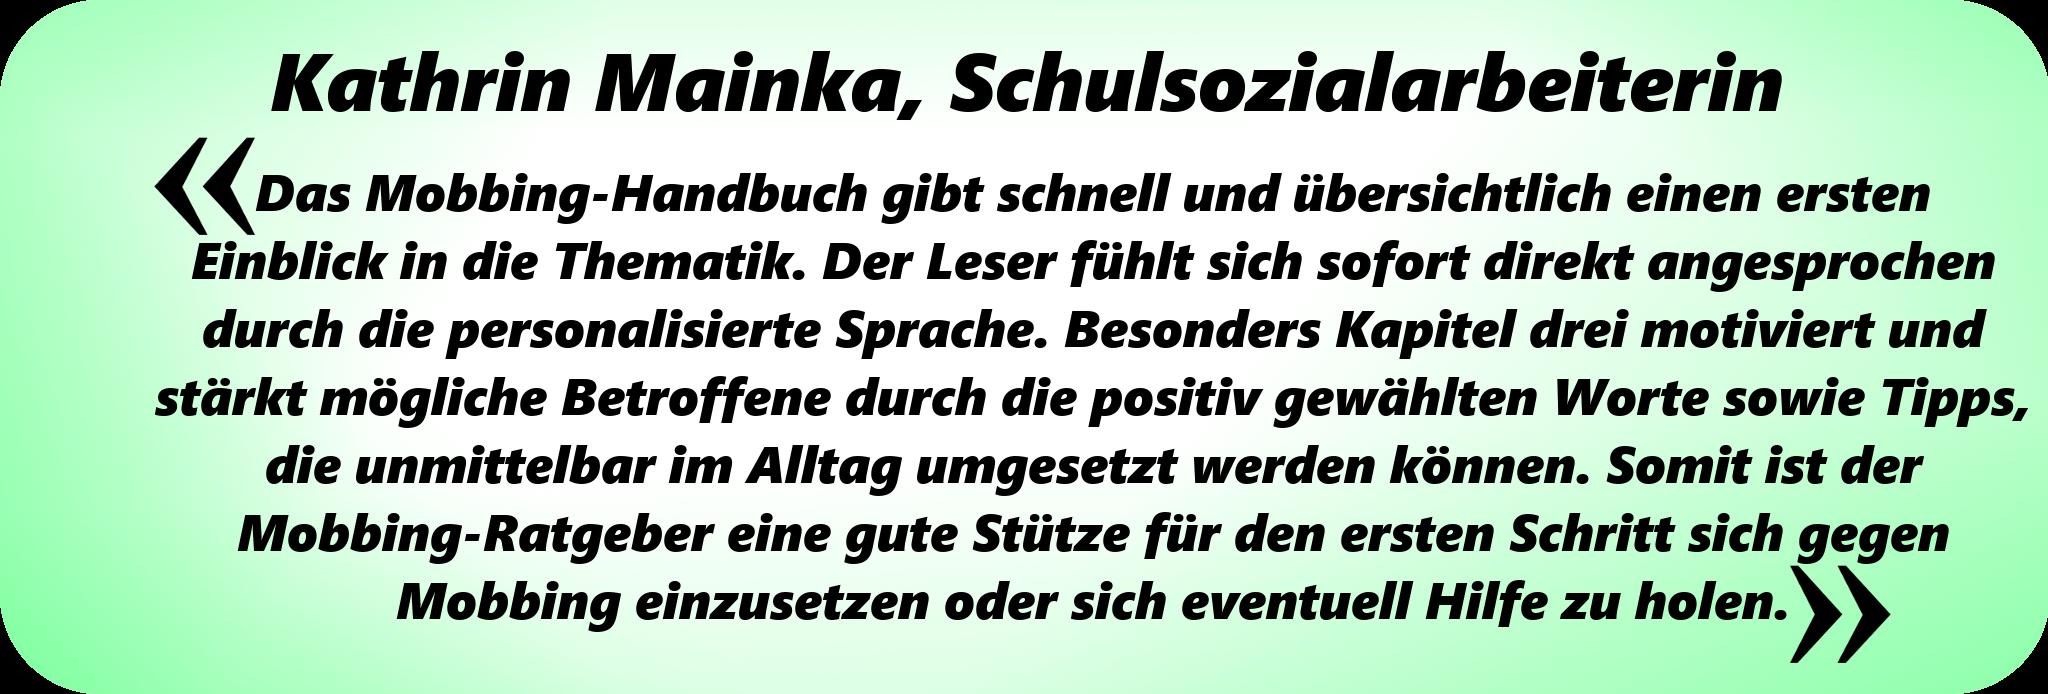 Testimonial-dasmobbinghandbuch-KathrinMainka